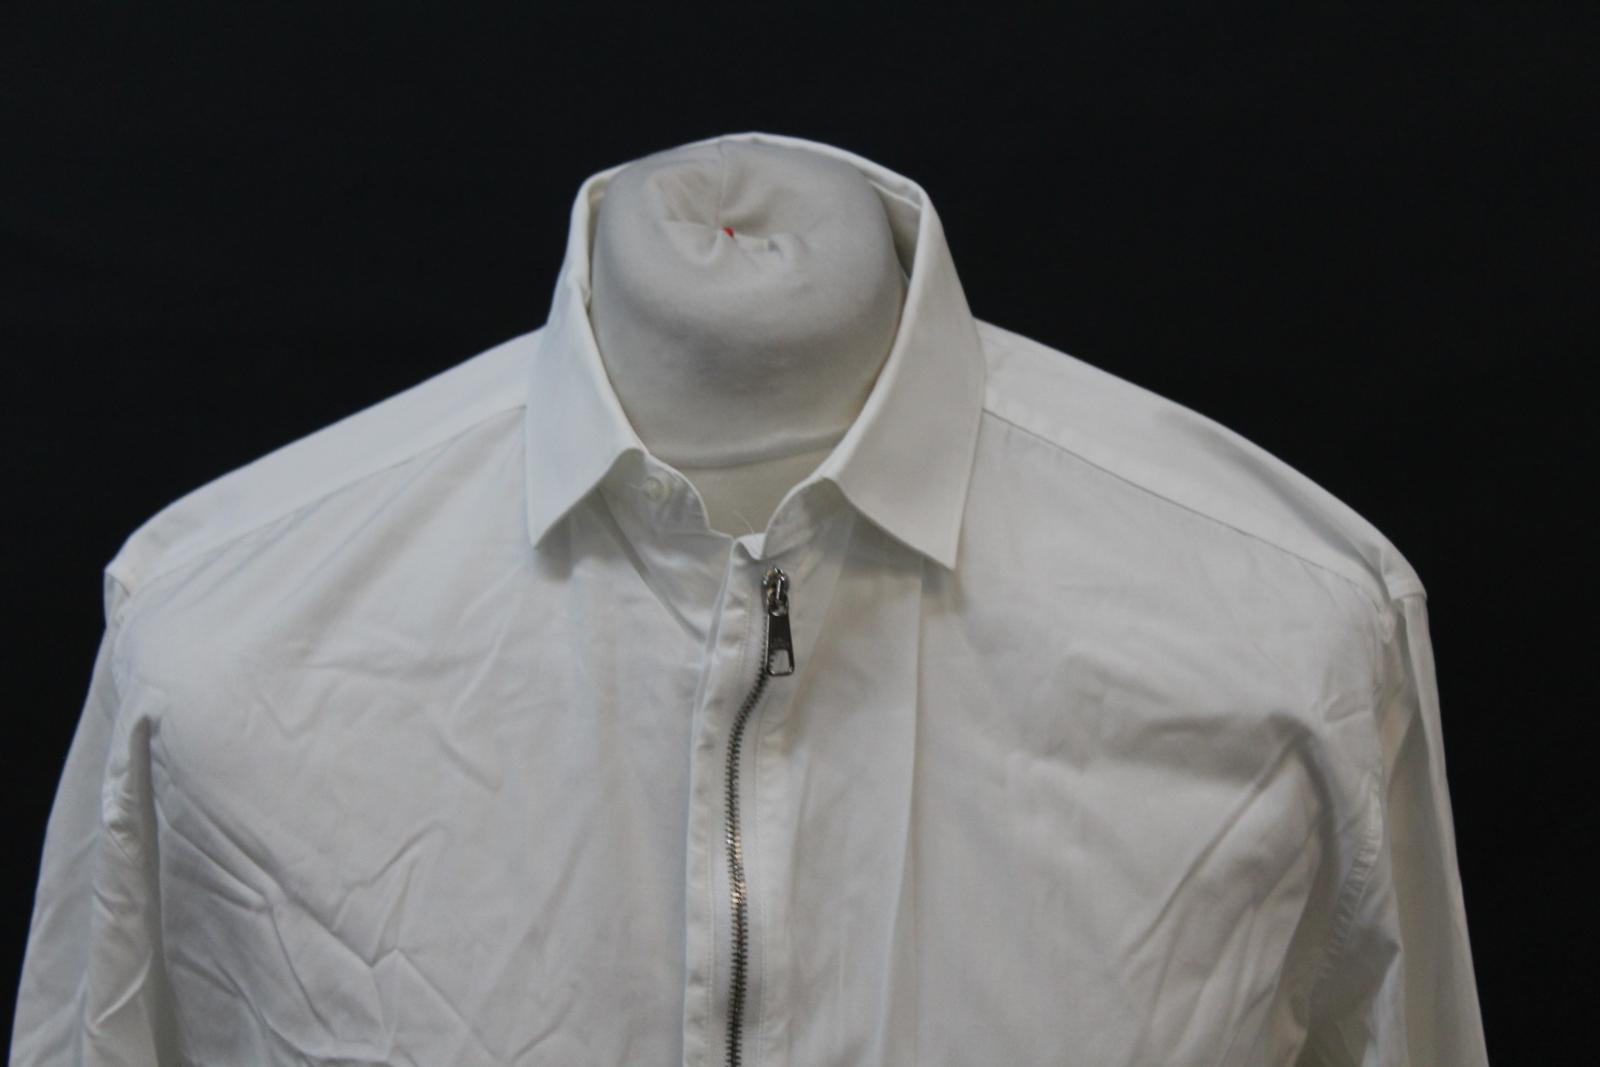 Neil-Barrett-para-hombre-calce-cenido-de-algodon-Blanco-Detalle-De-Cremallera-Botones-Camisa-Cuello miniatura 3